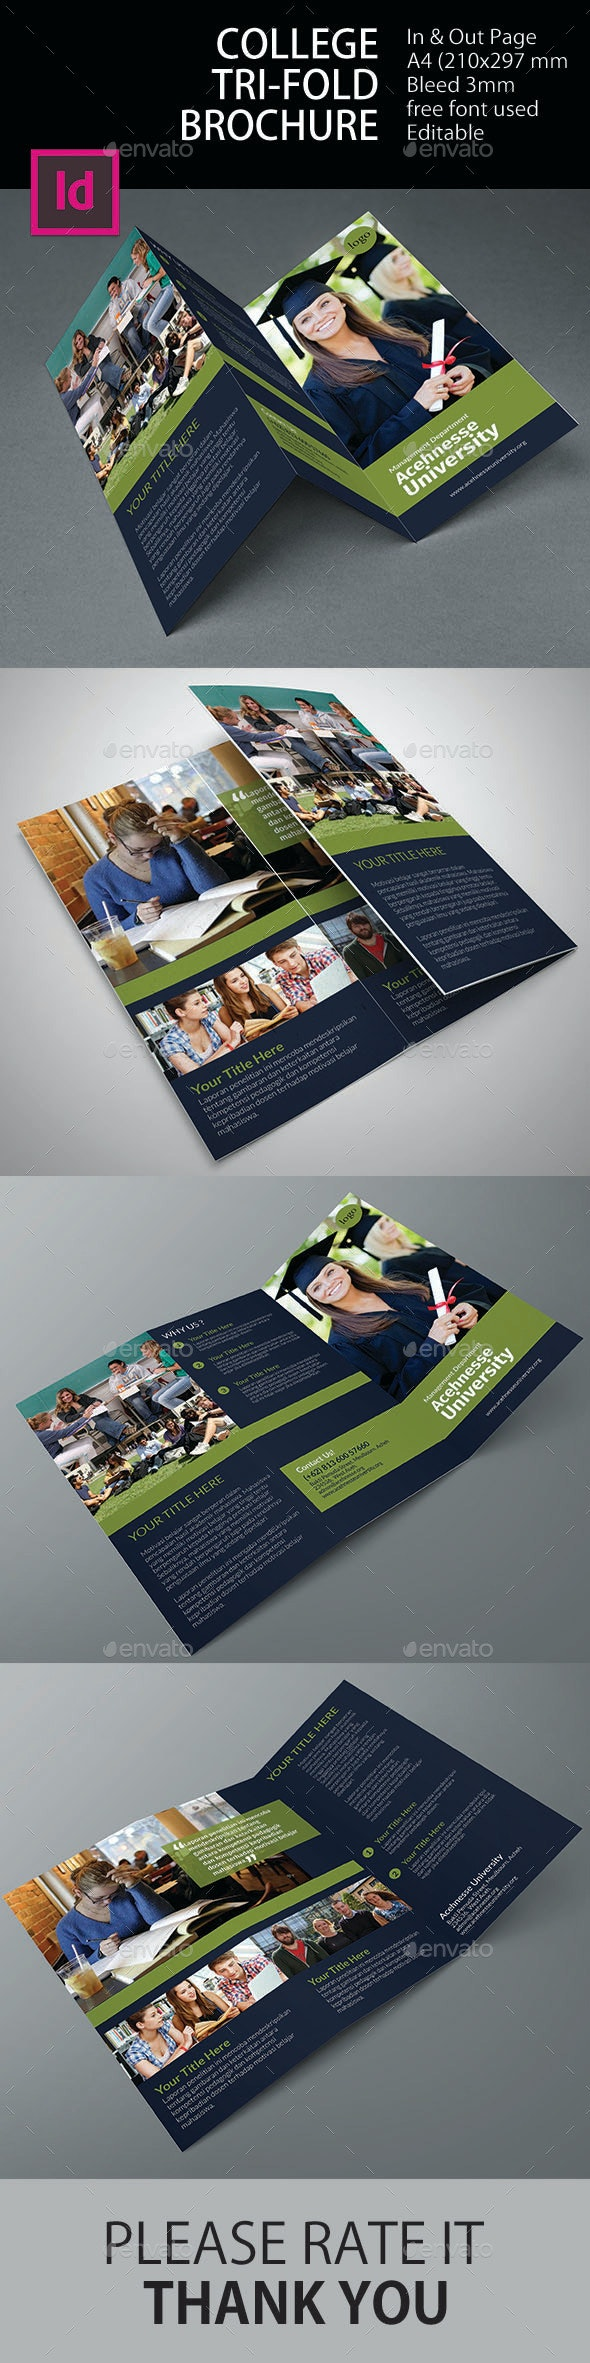 College Tri-Fold Brochure - Informational Brochures